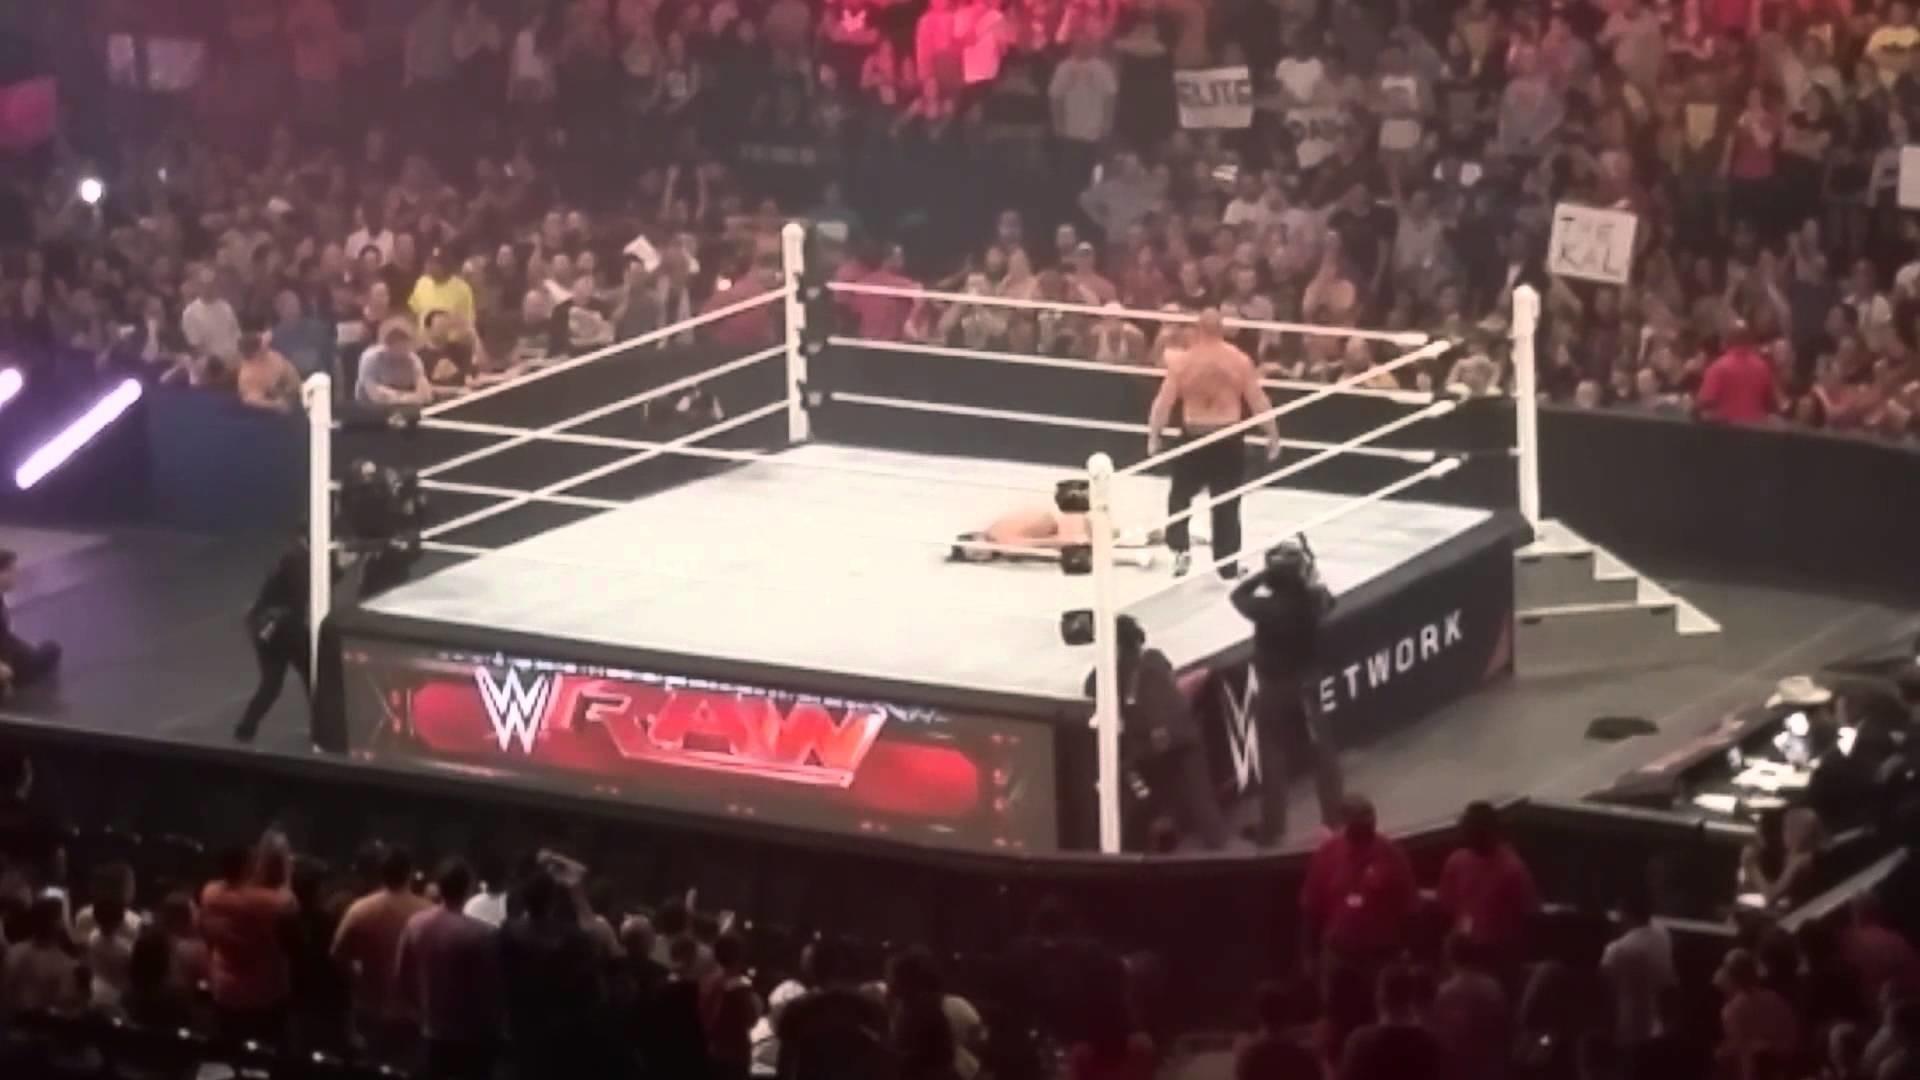 Bo Dallas dies in the ring by BROCK LESNAR